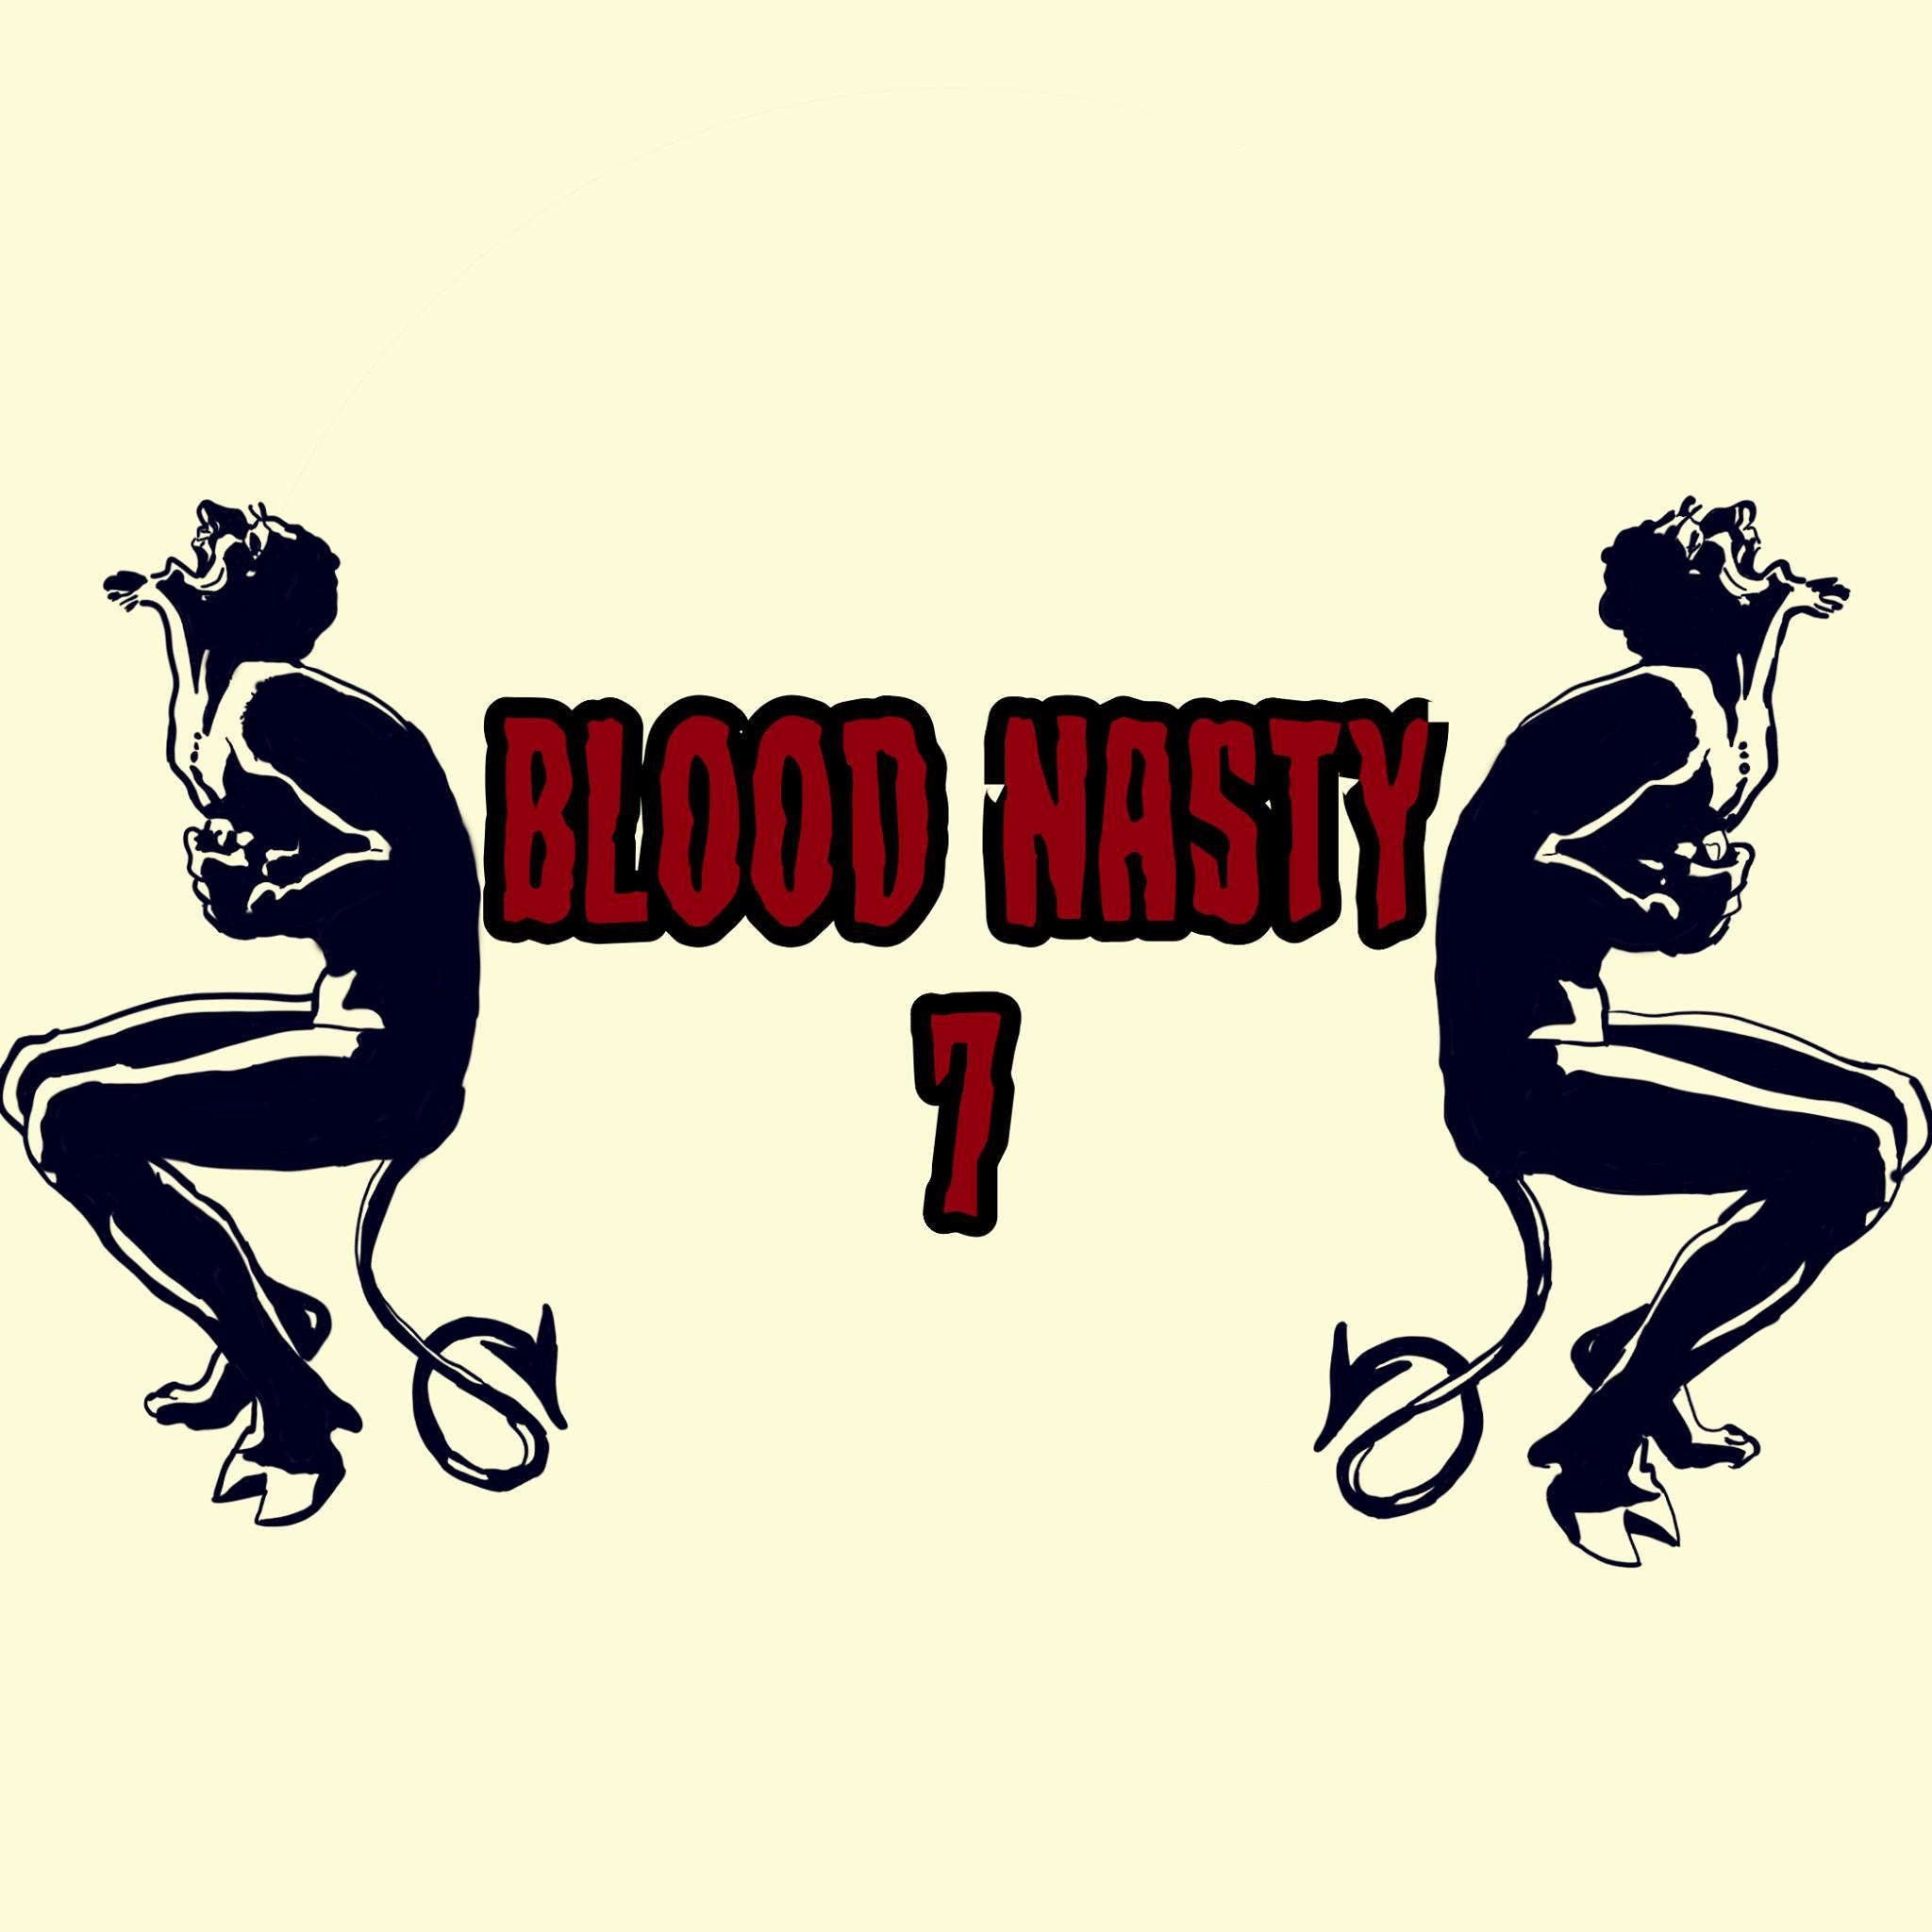 Blood Nasty VII